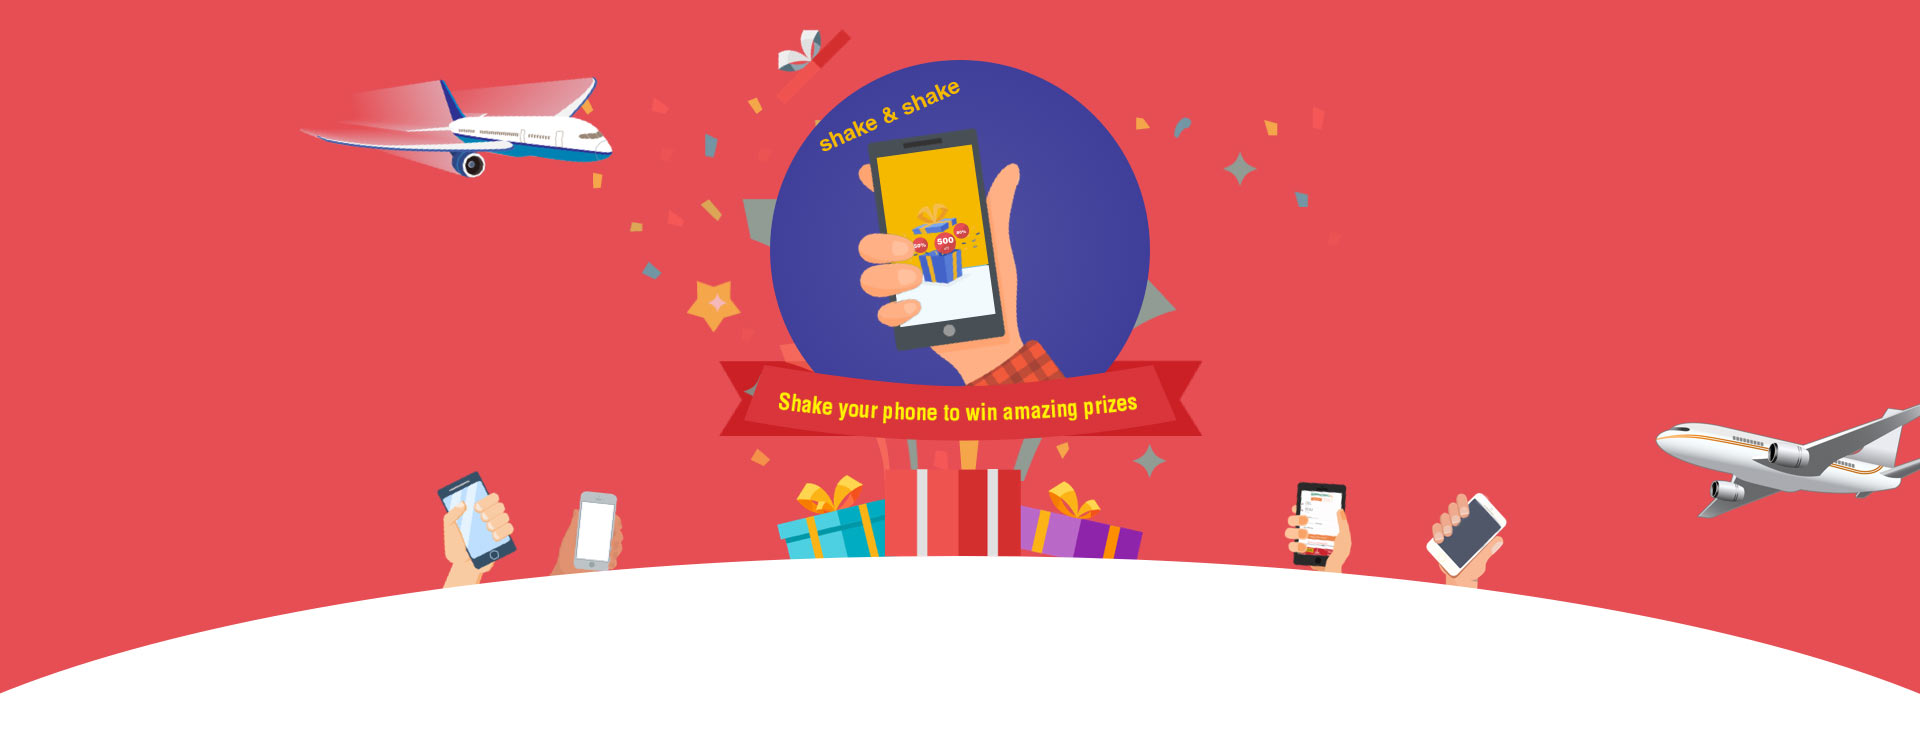 Shake Your Phone and Win Amazing Prizes on HappyEasyGo App